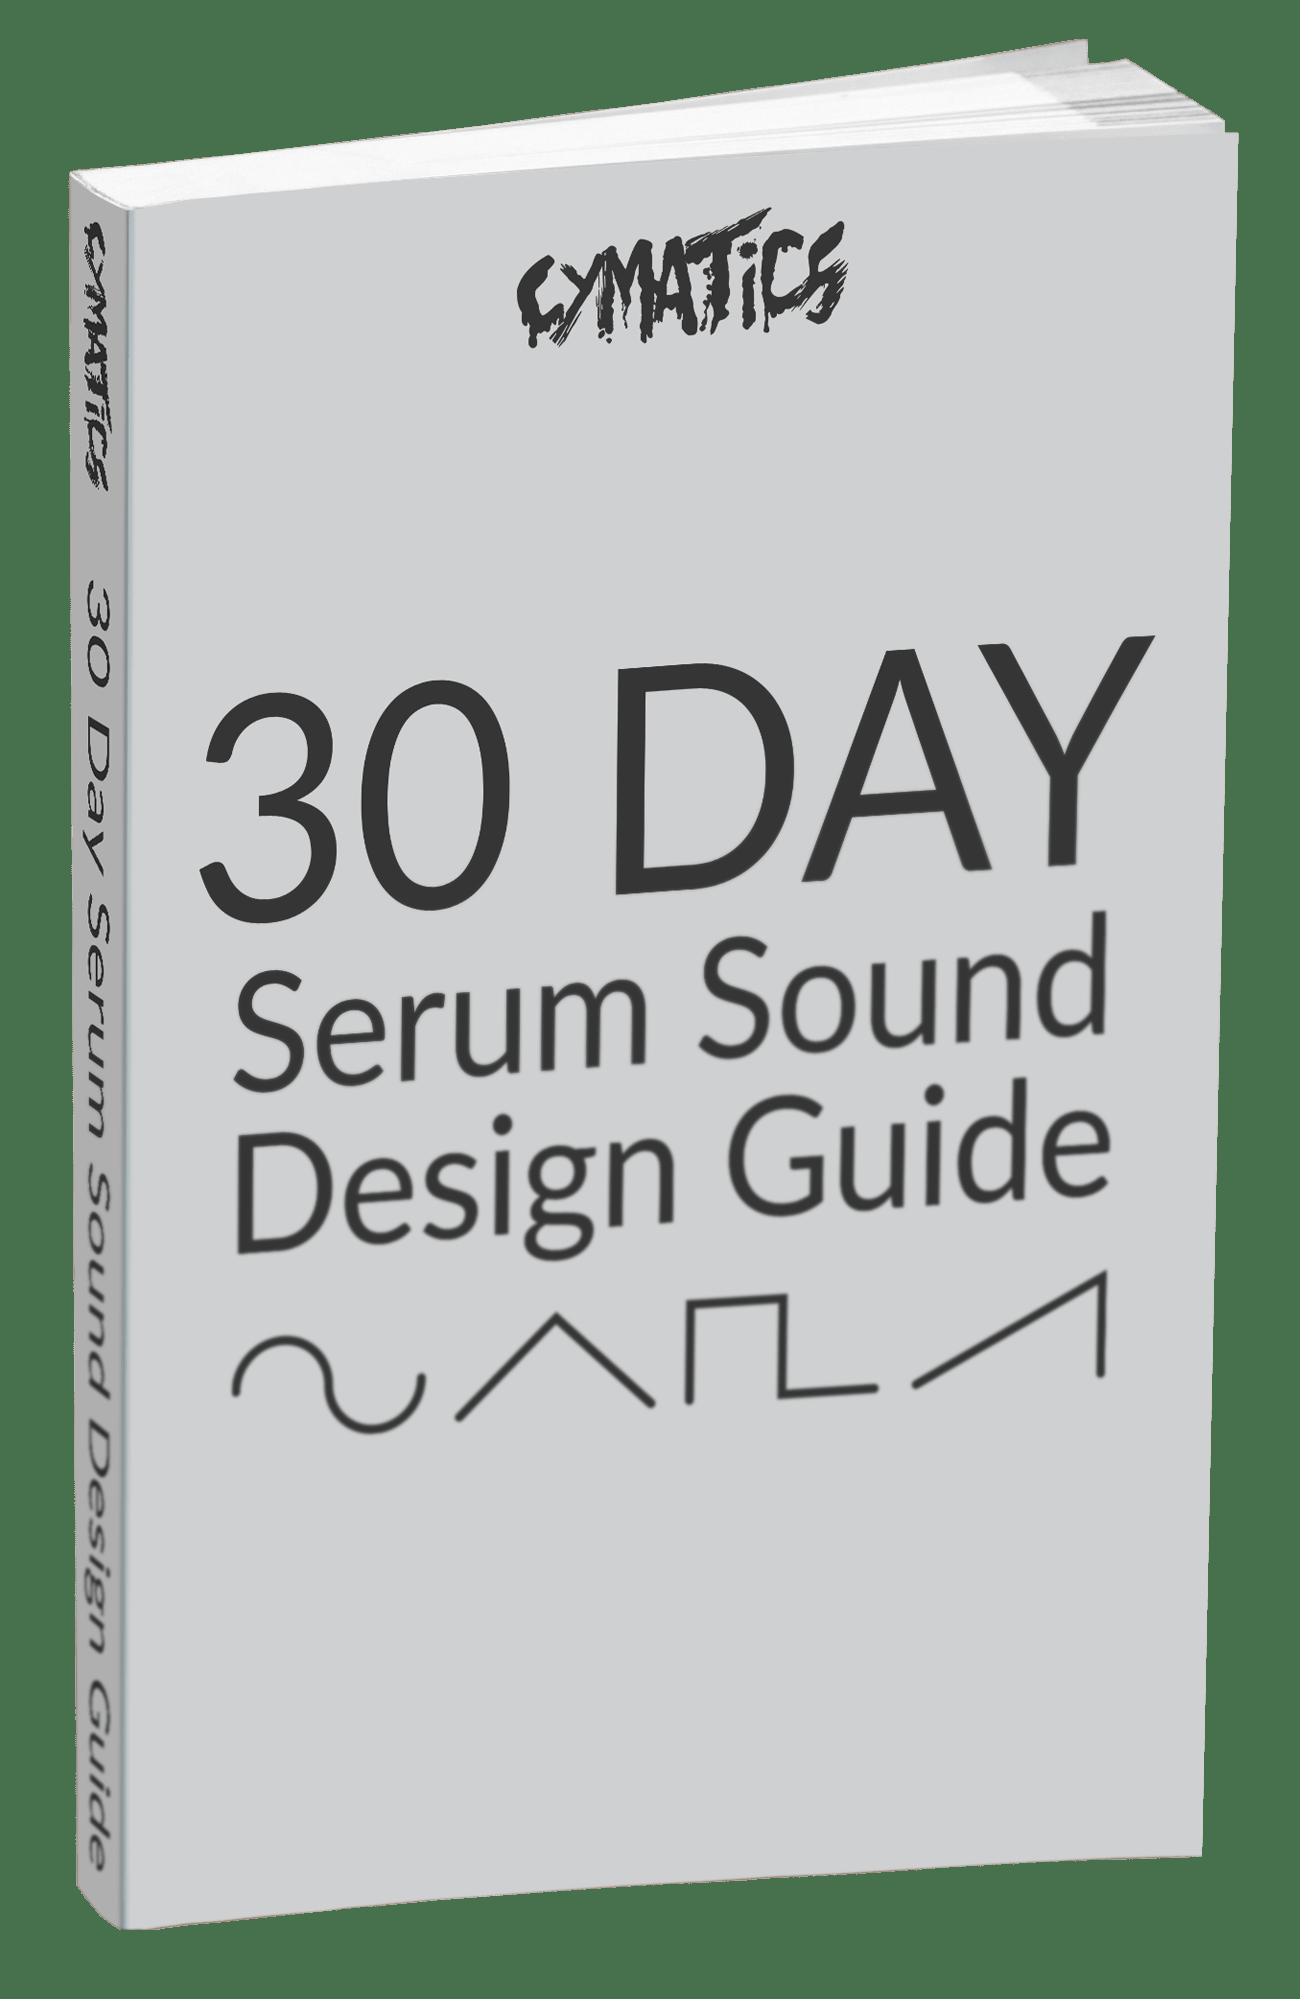 cymatics serum tutorial